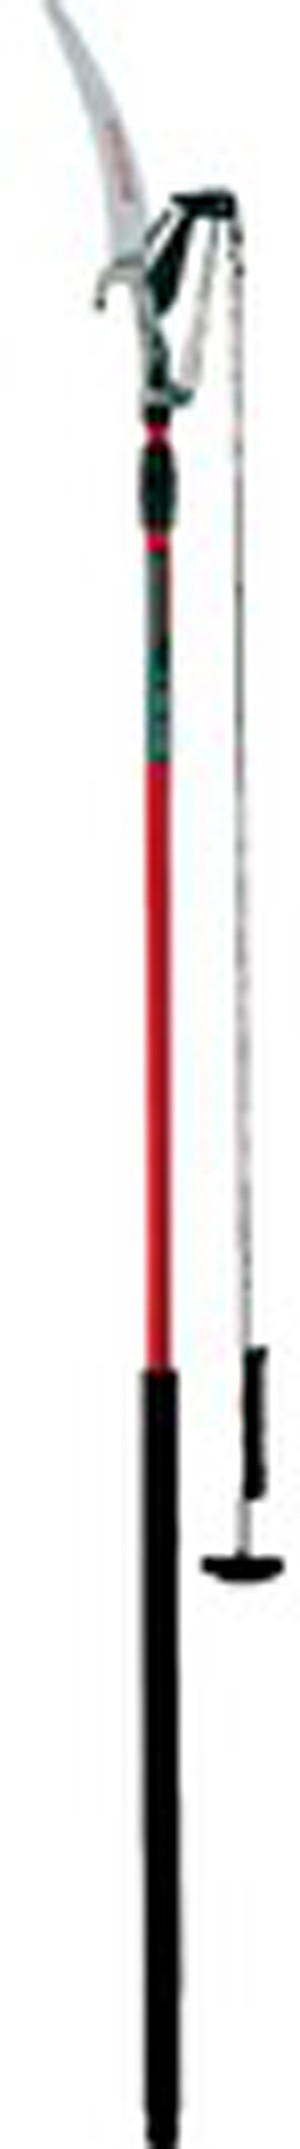 Corona Dual Compound Action Tree Pruner w/ Fiberglass Pole 1-1/4in Cut 4ea/14 ft